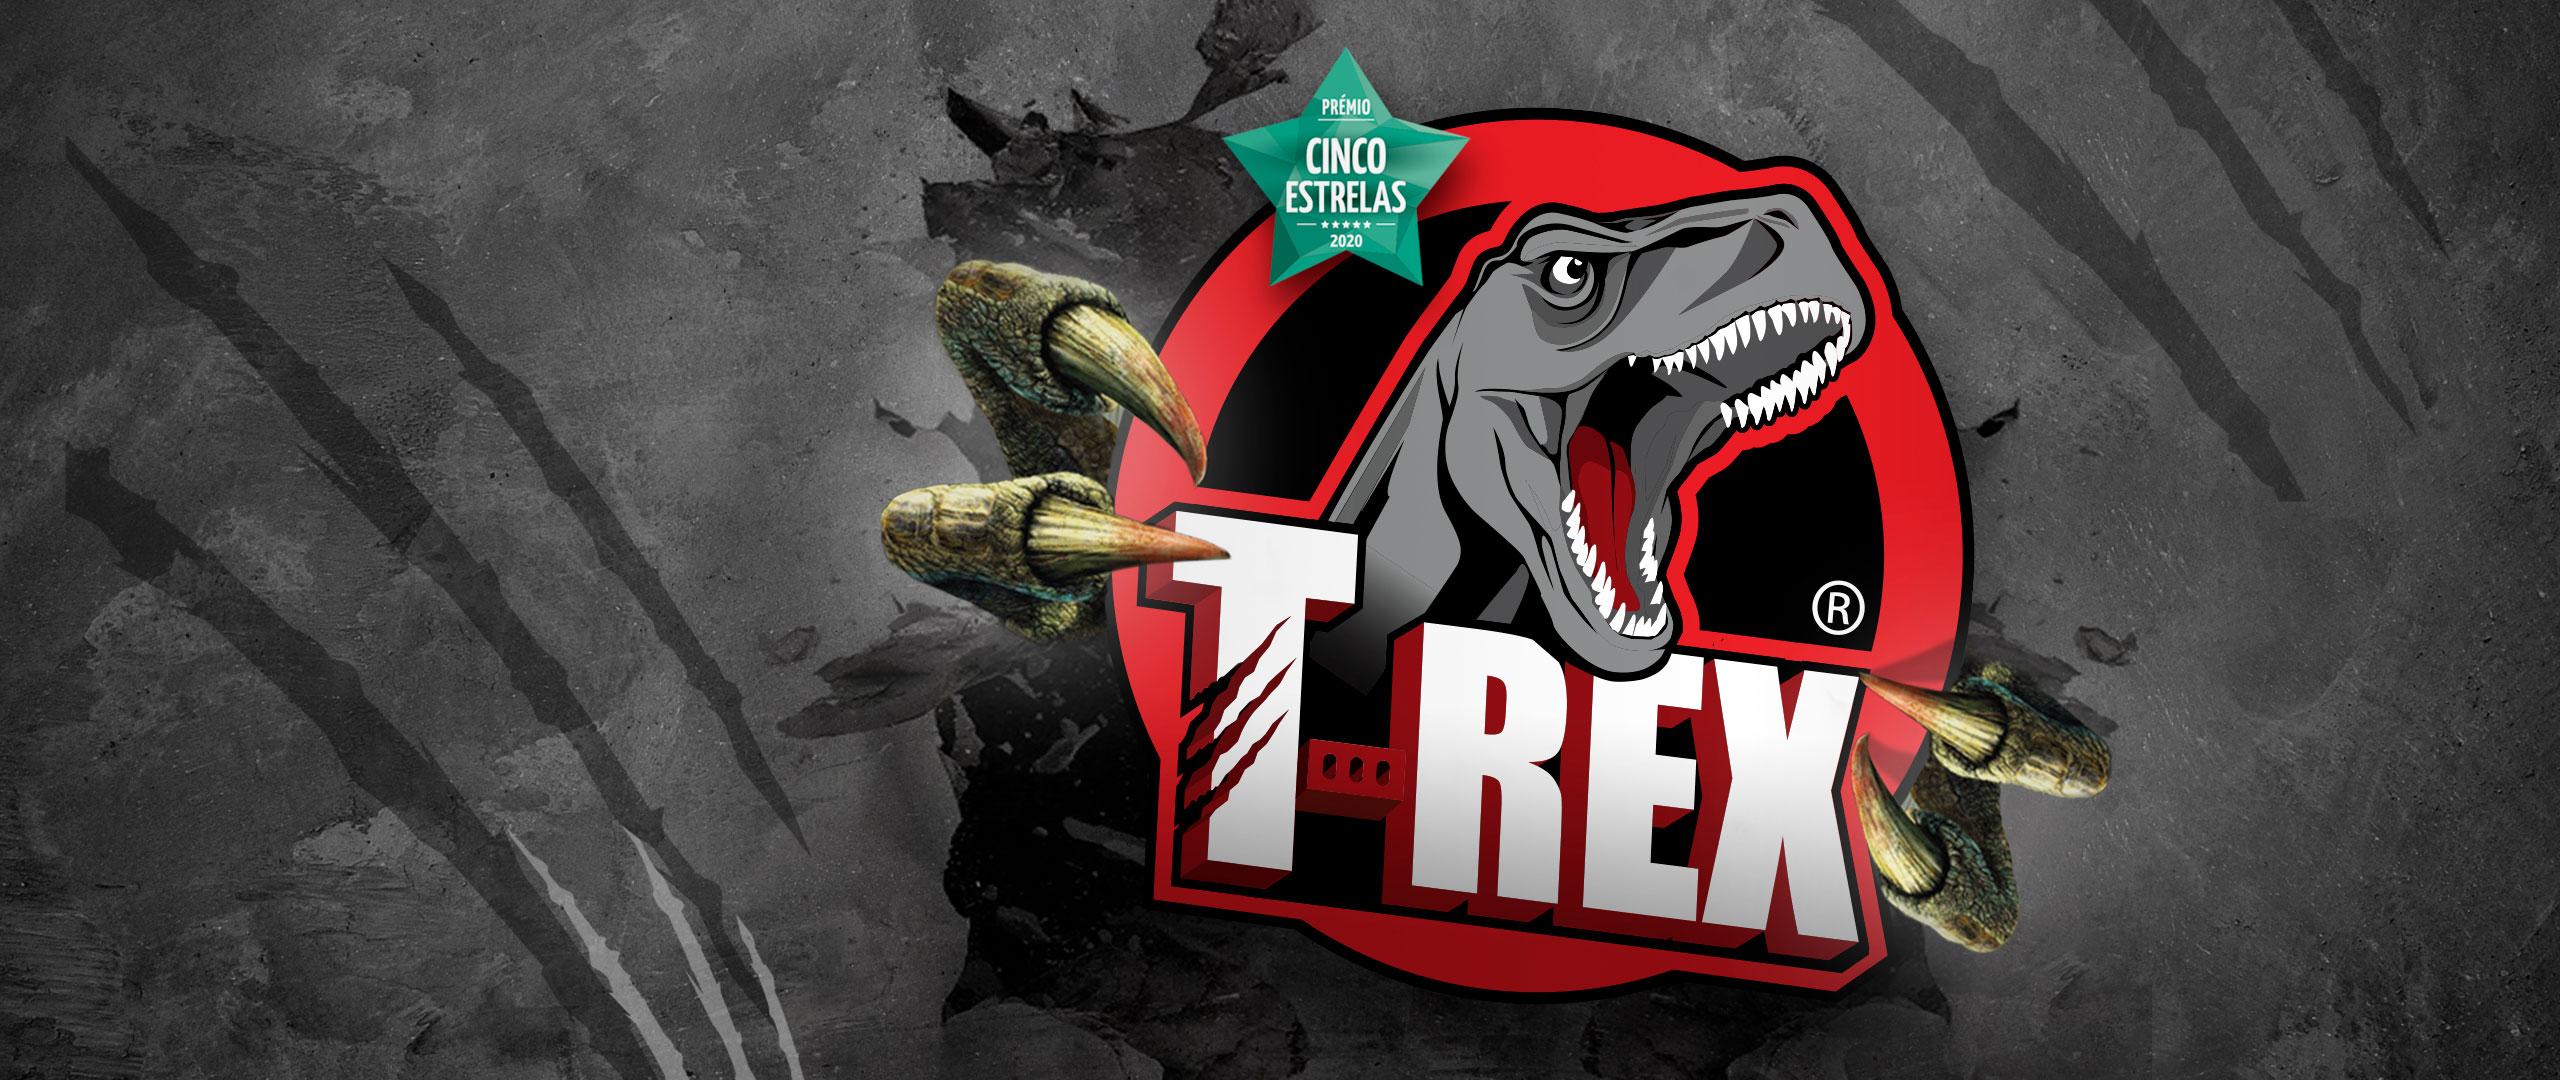 T-Rex força extrema